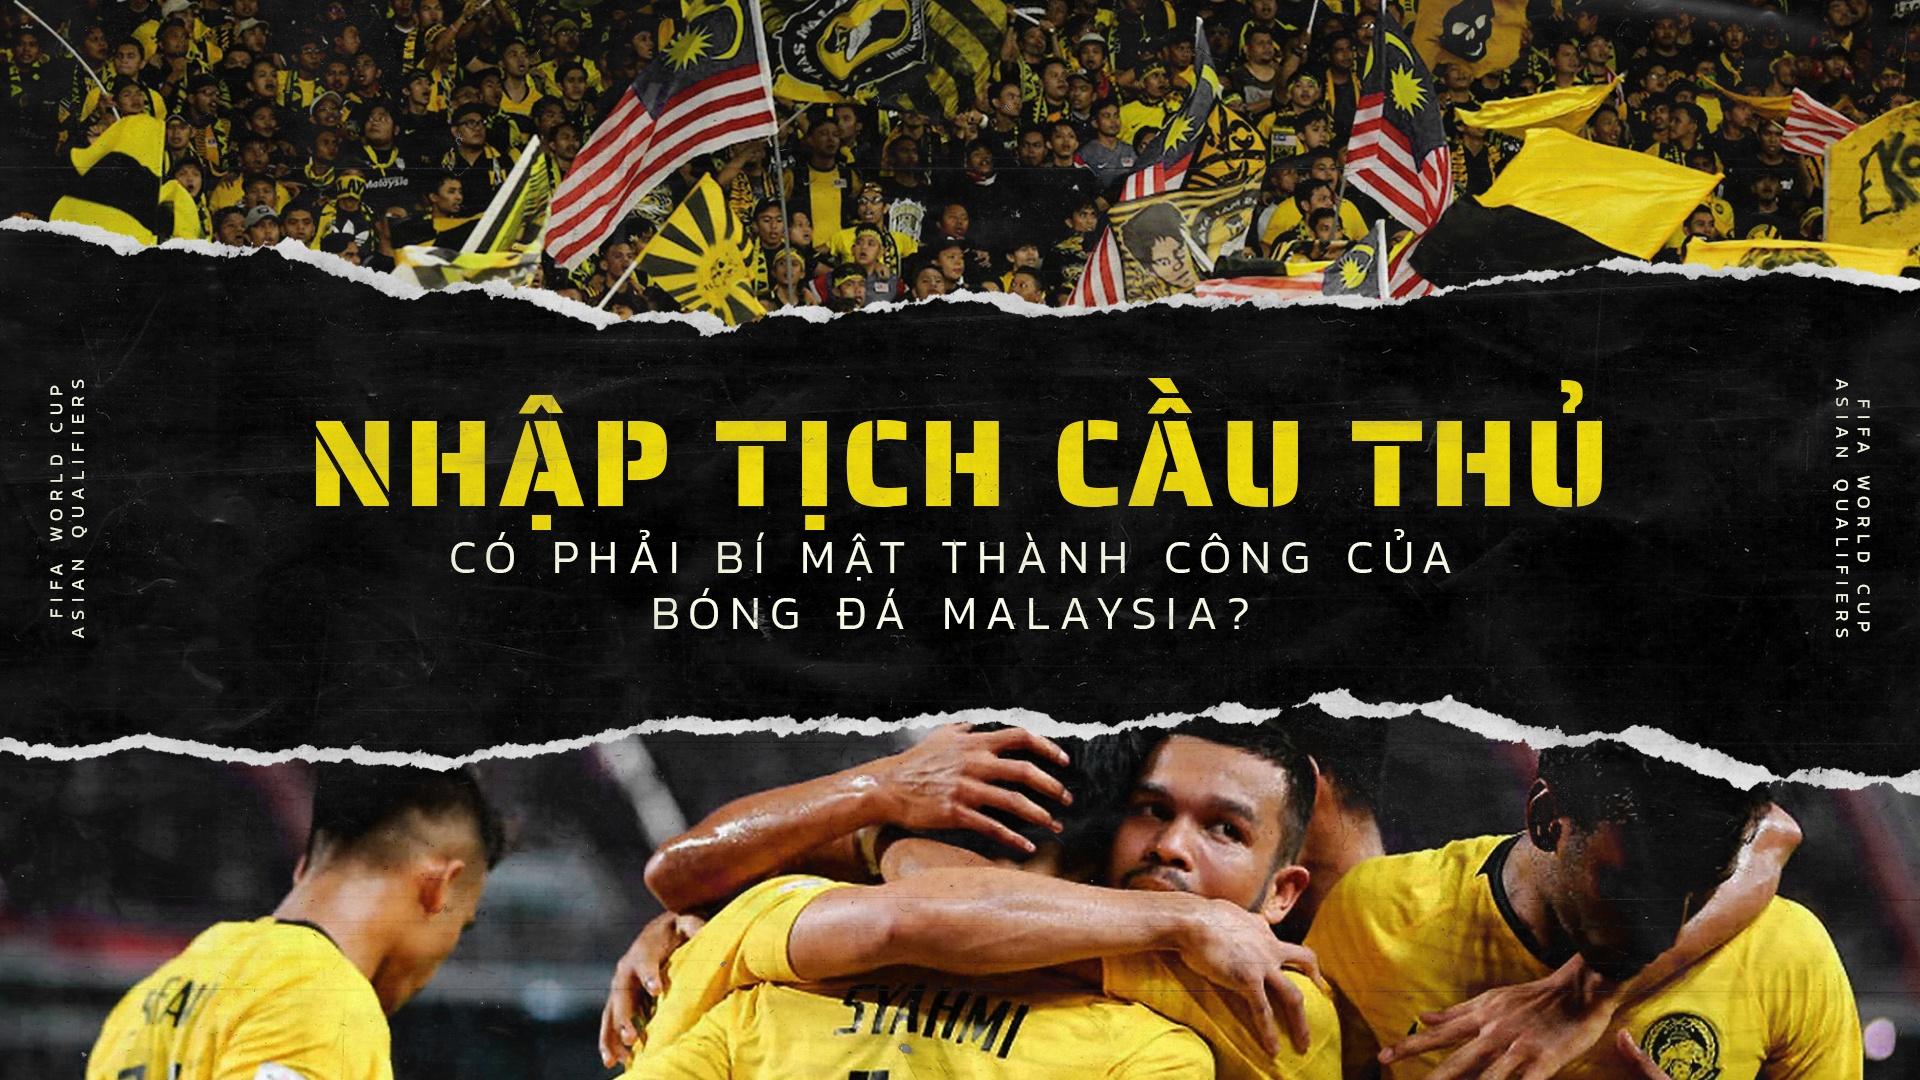 Vi sao 'The he Vang' cua Malaysia khong thanh cong nhu Viet Nam hinh anh 2